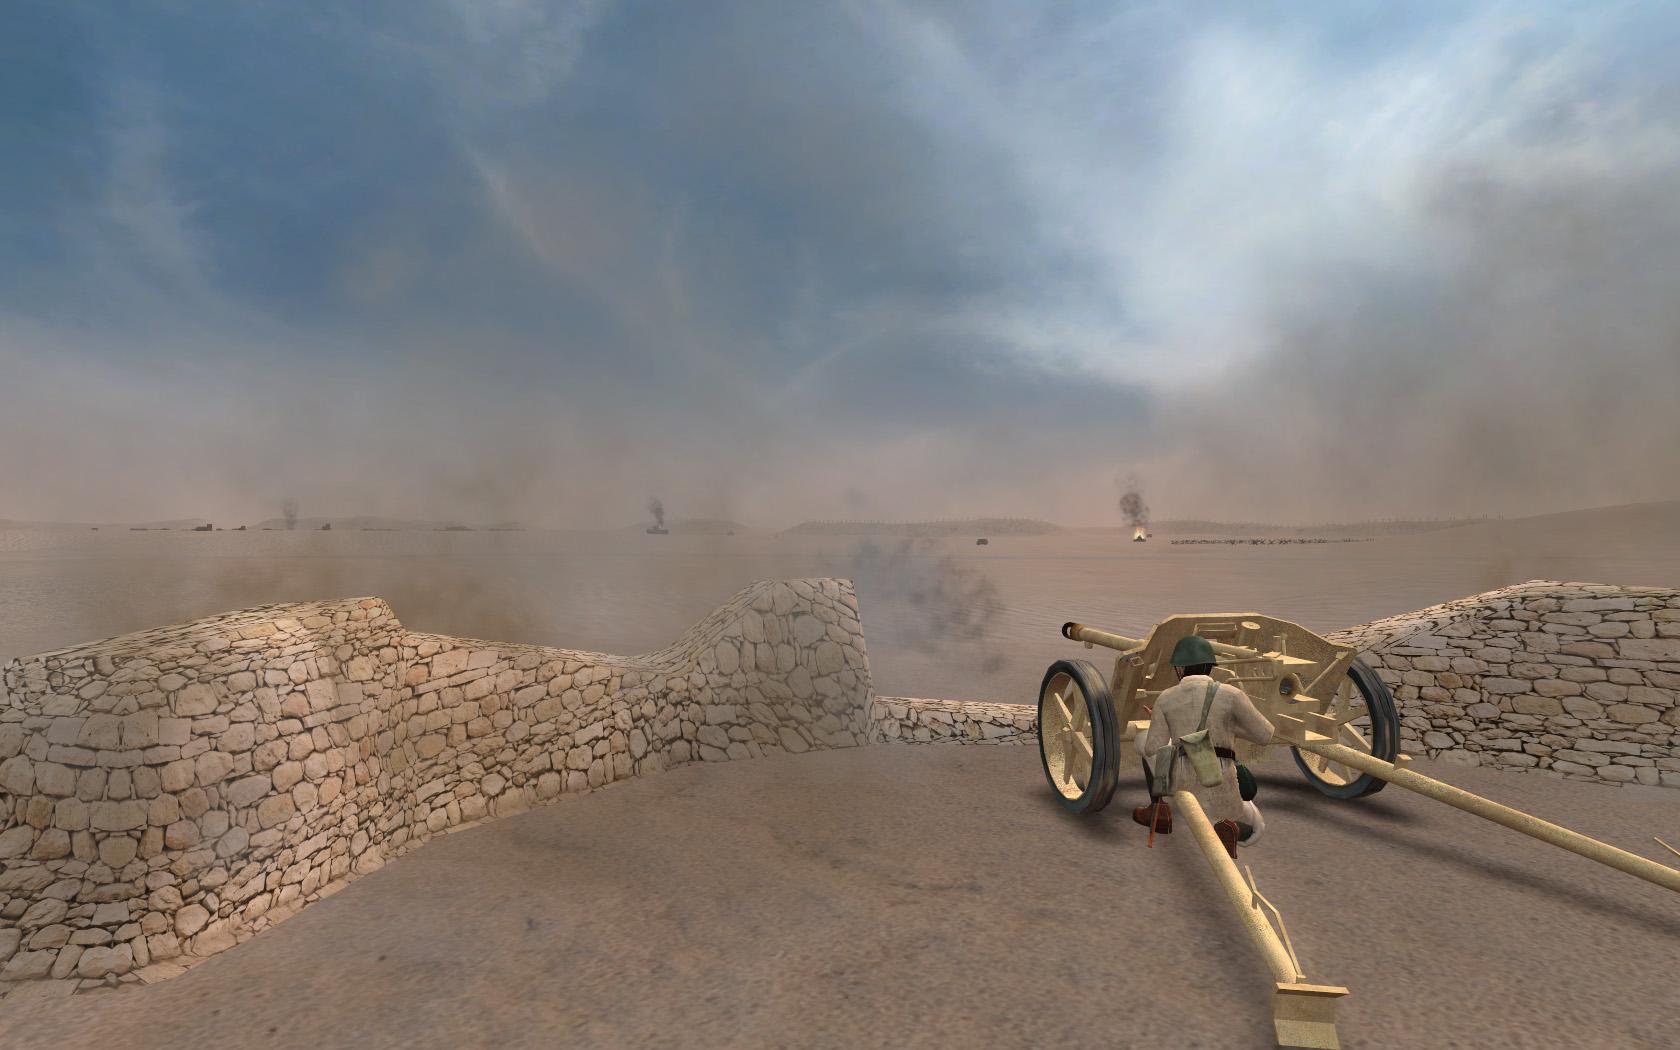 Mare Nostrum screenshot